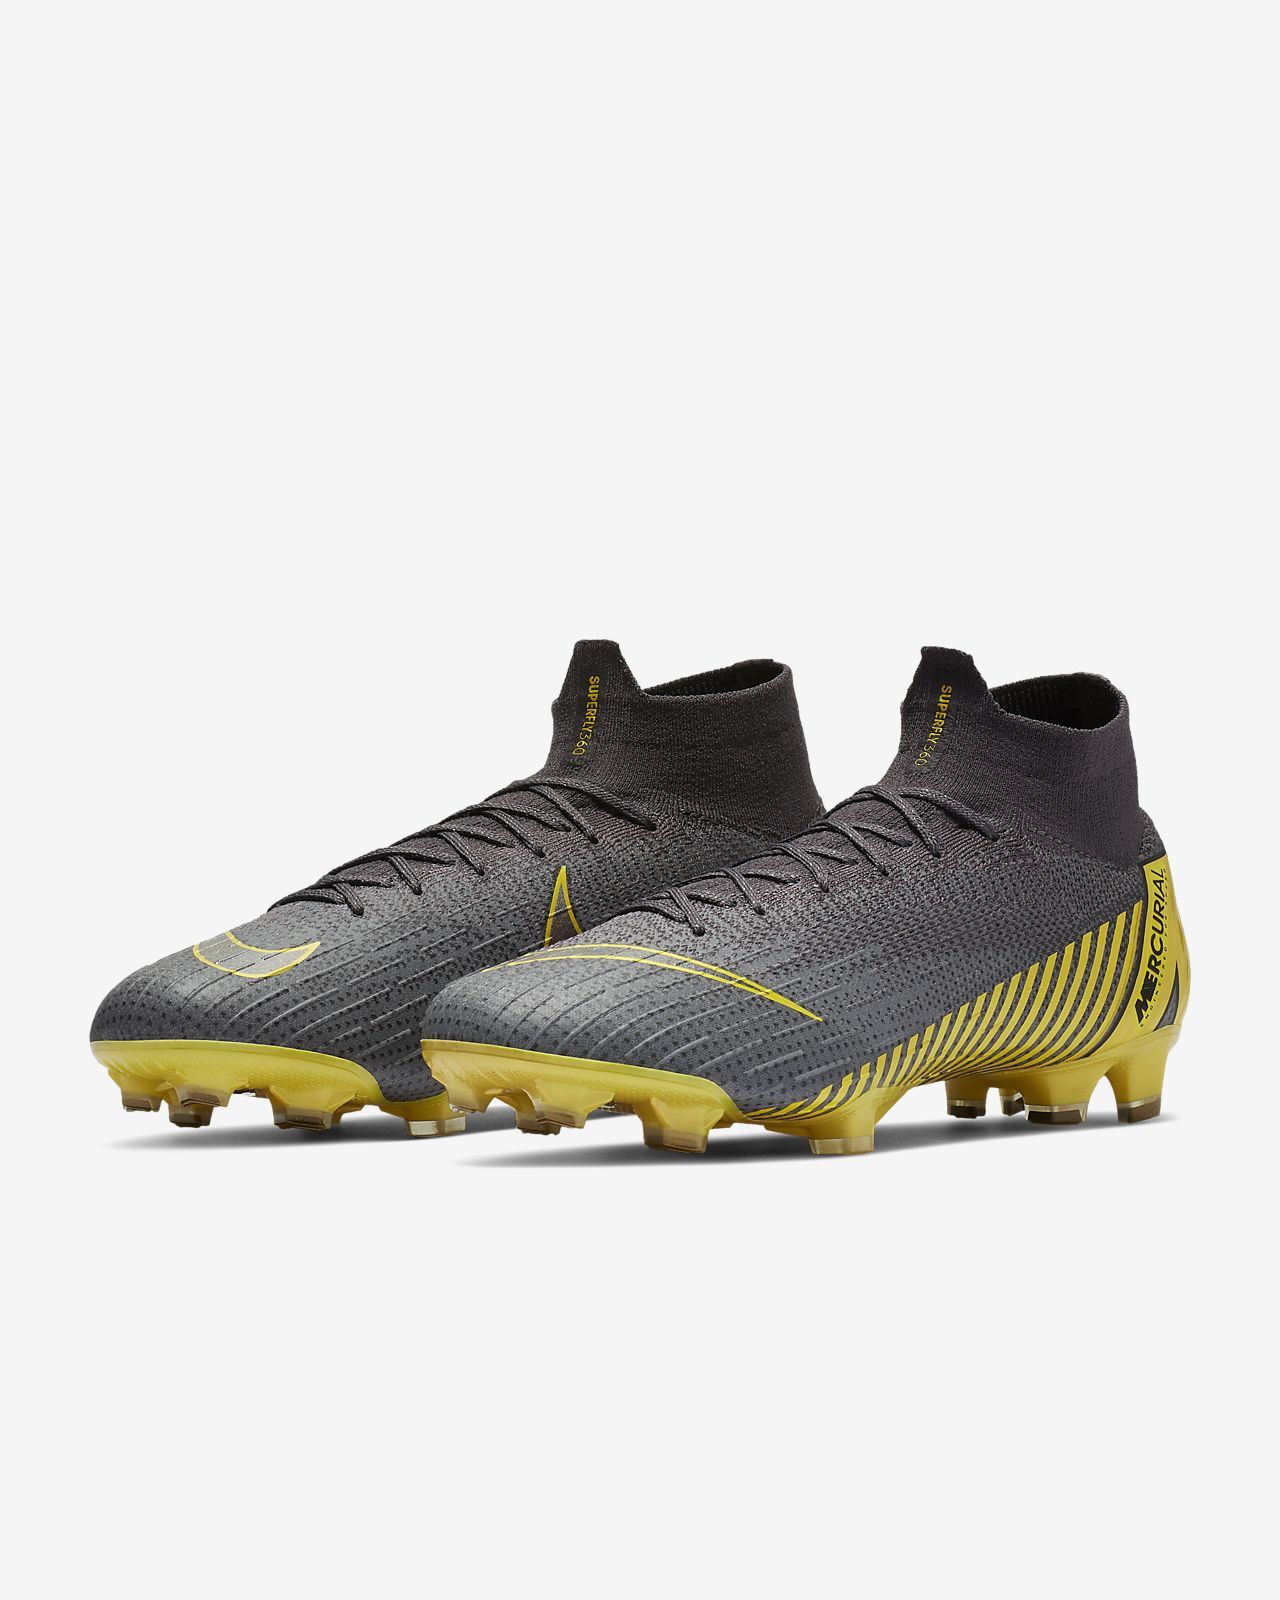 new product b17bc f7b6c ... Fotbollssko för gräs Nike Superfly 6 Elite FG Game Over